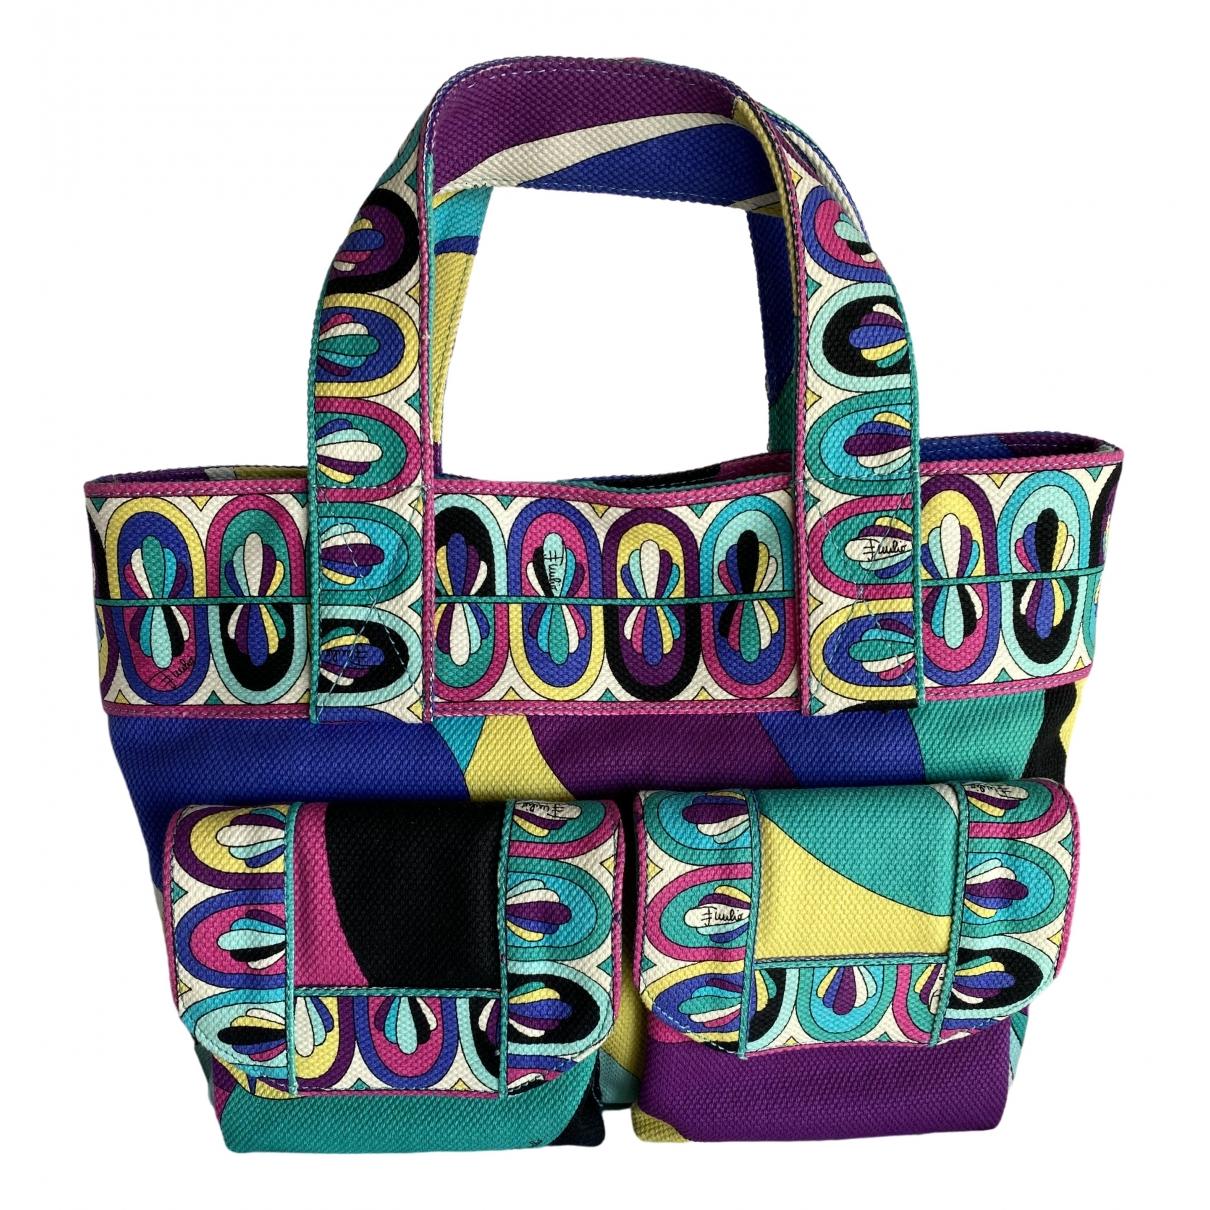 Emilio Pucci \N Multicolour Cotton handbag for Women \N